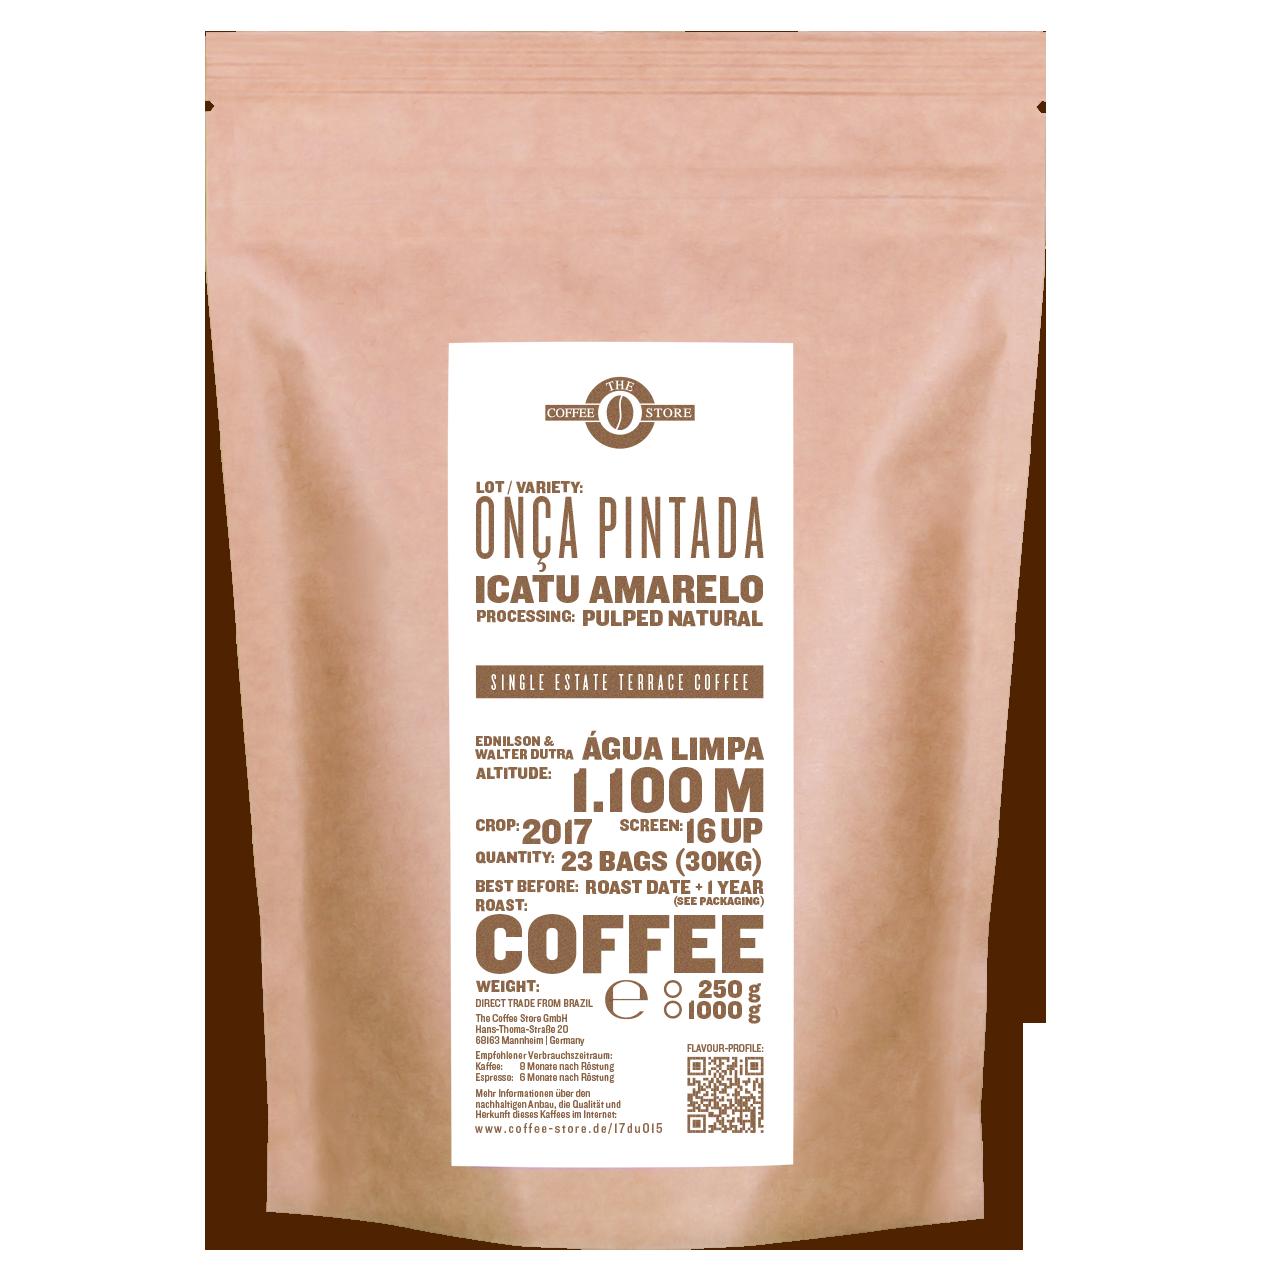 Onca Pintada, Icatu amarelo - Kaffeeröstung